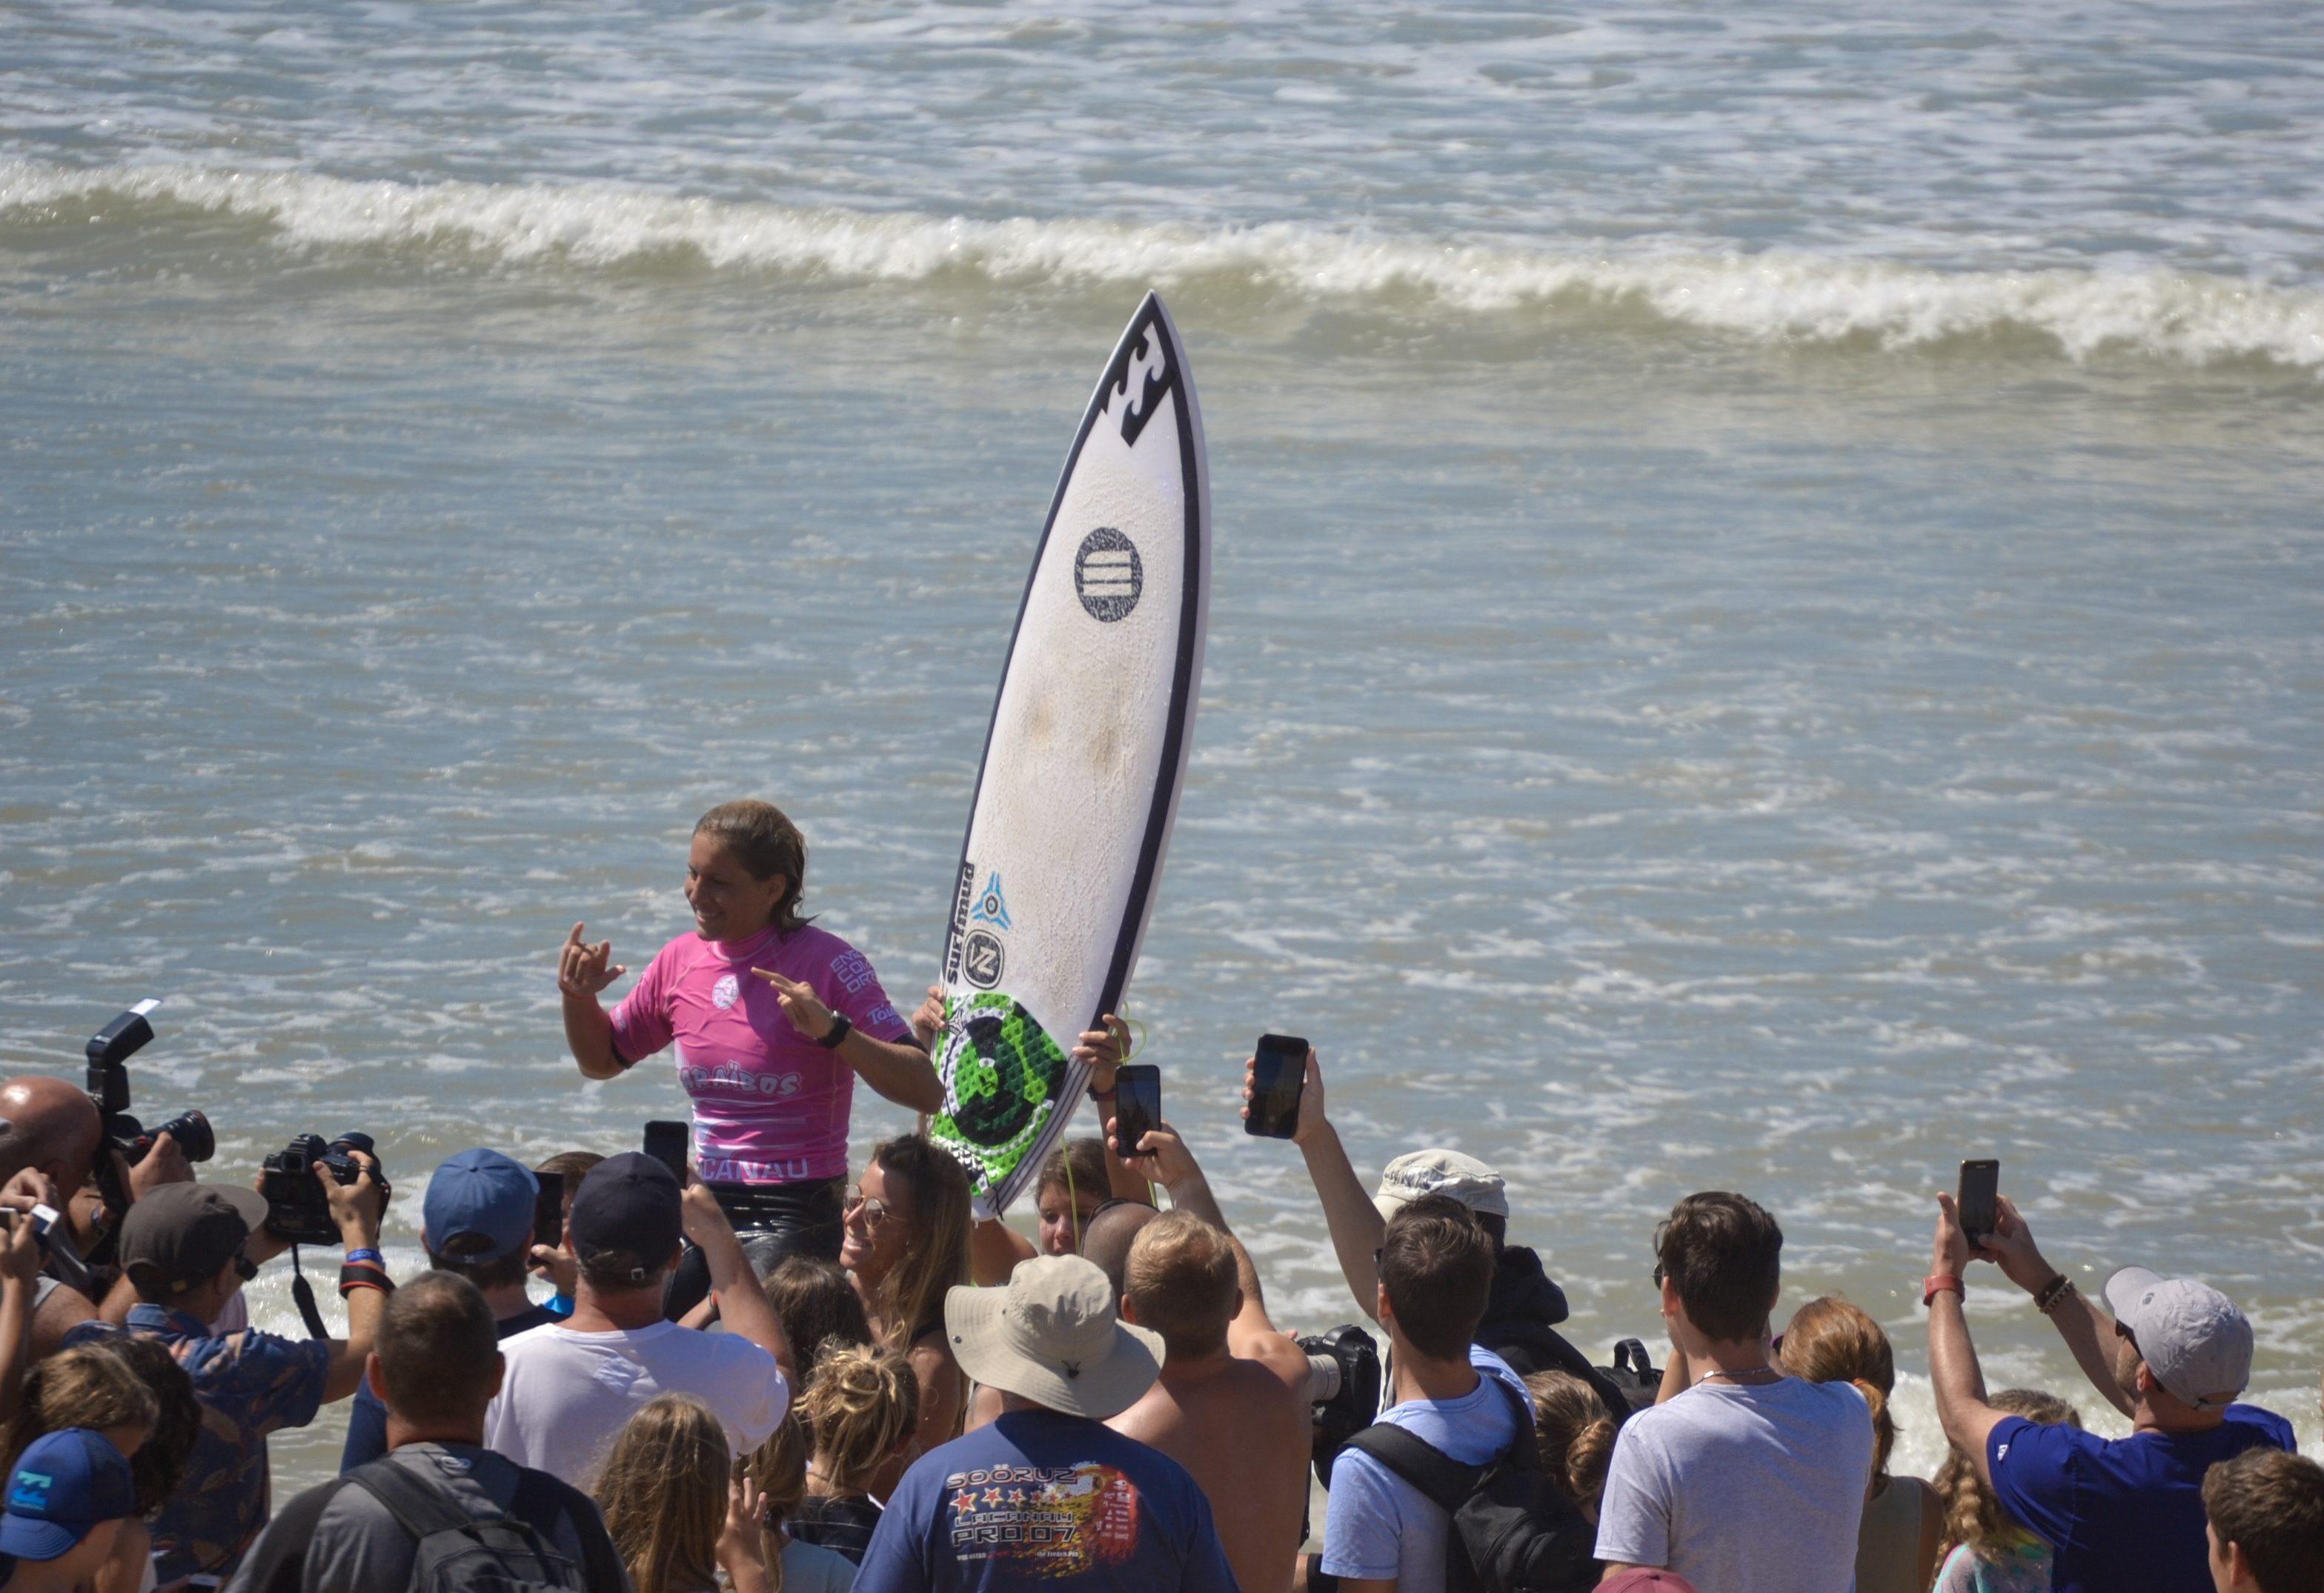 caraibos-lacanau-pro-surf-blog-voyage-les-ptits-touristes-wsl-kelly-zahli